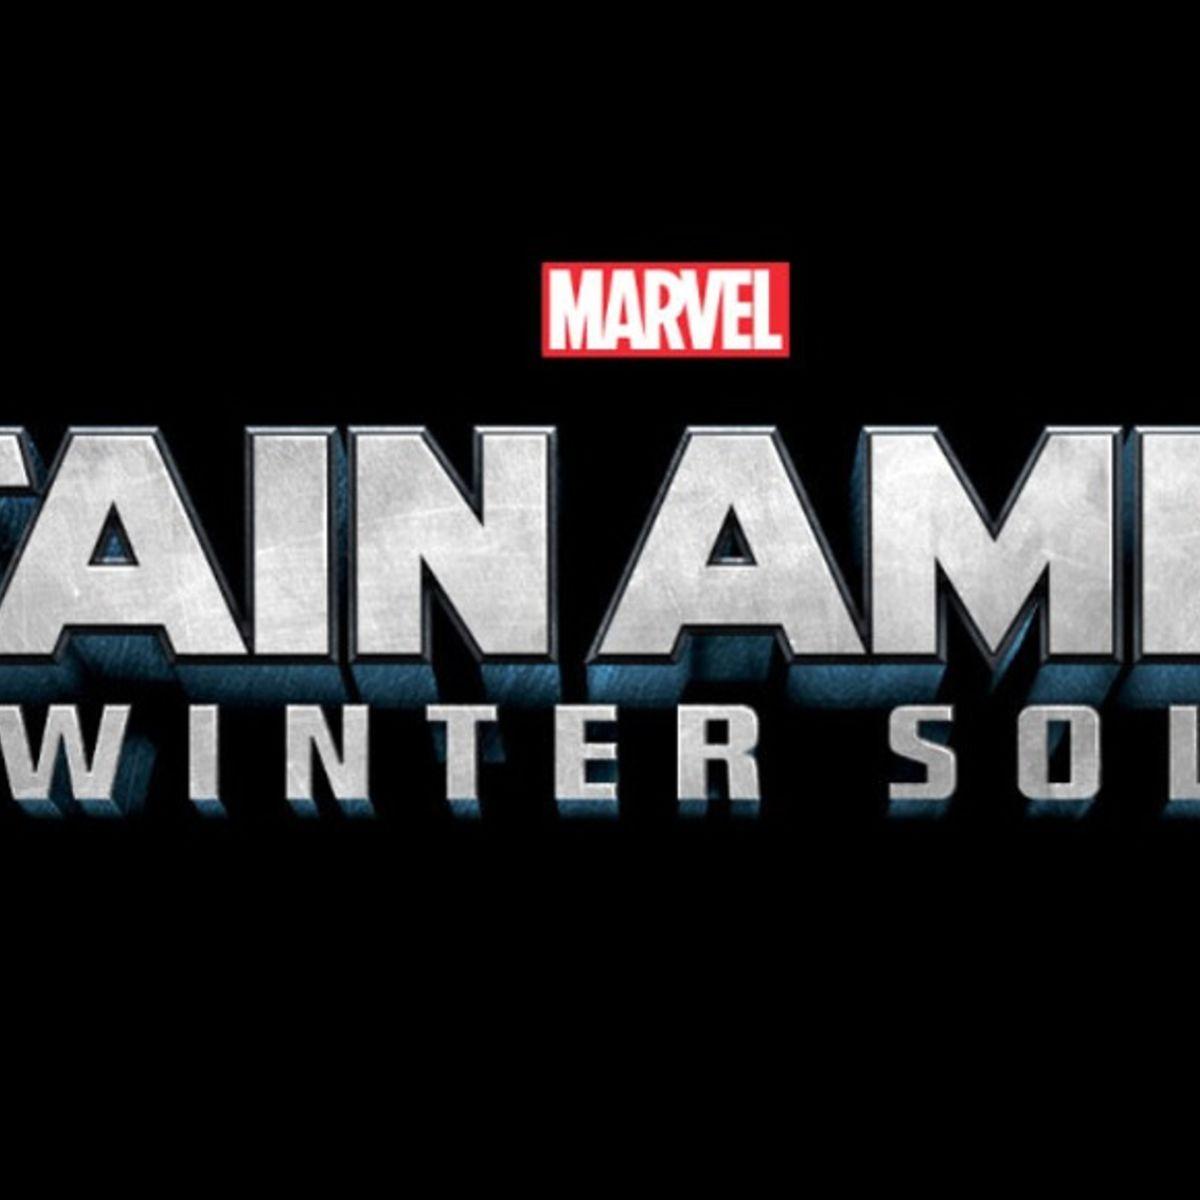 Captain_America_The_Winter_Soldier_2014_Wallpaper.jpg